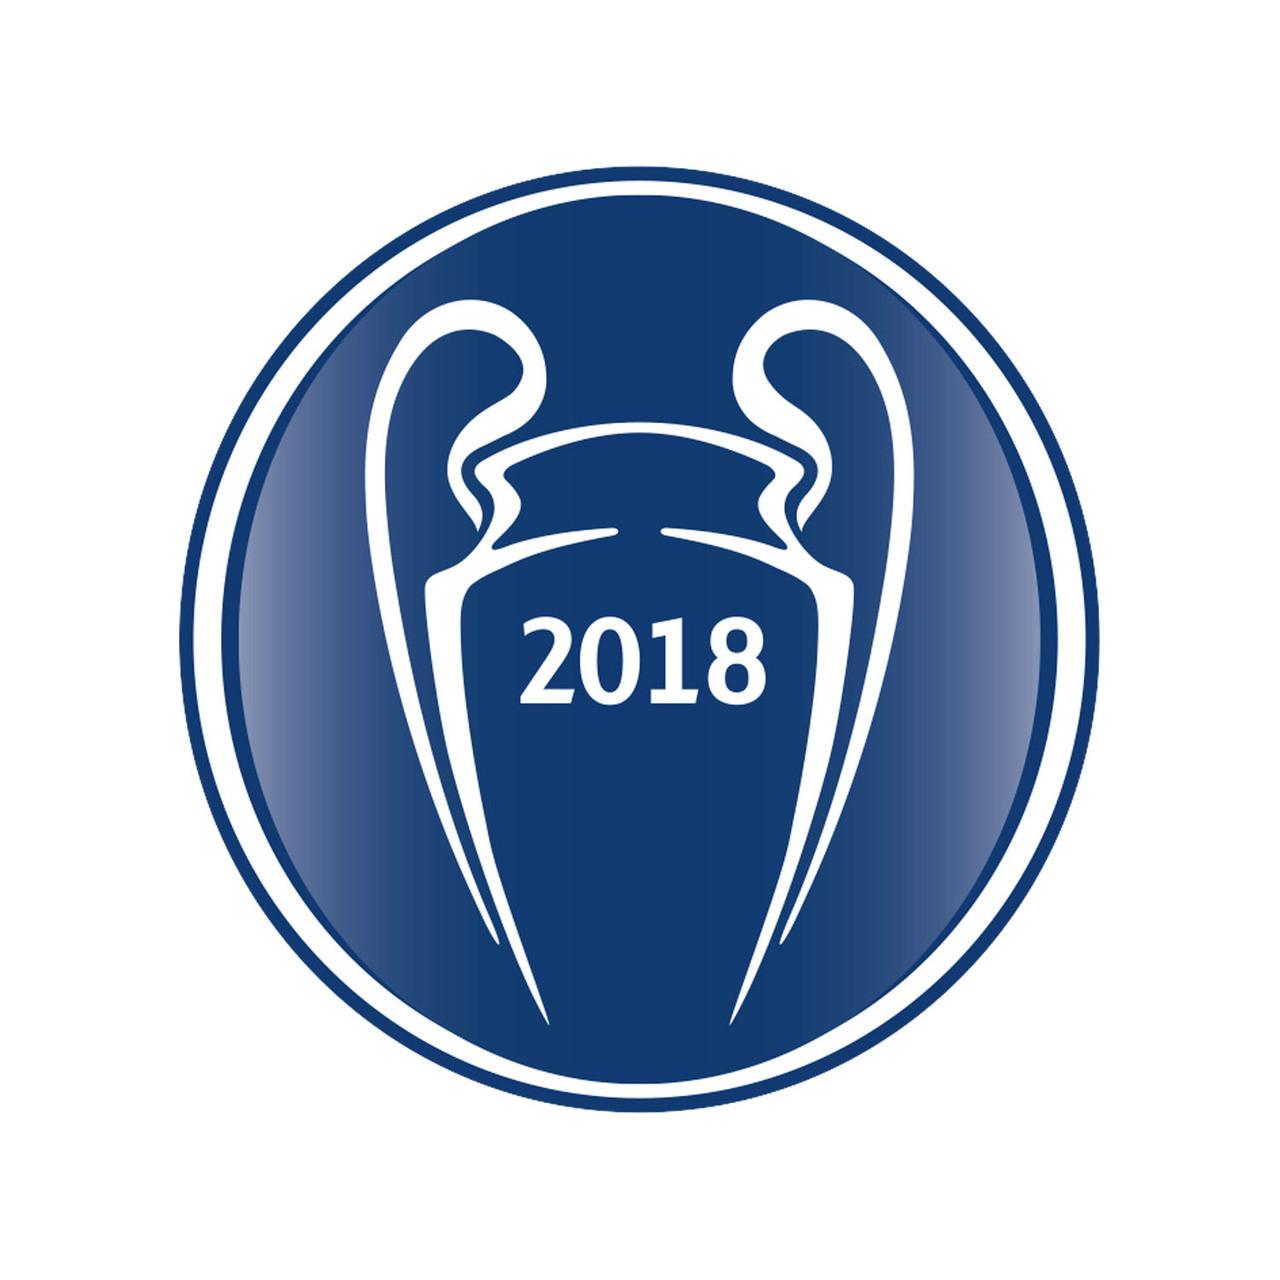 uefa champions league winners 2018 badge soccer plus uefa champions league winners 2018 badge